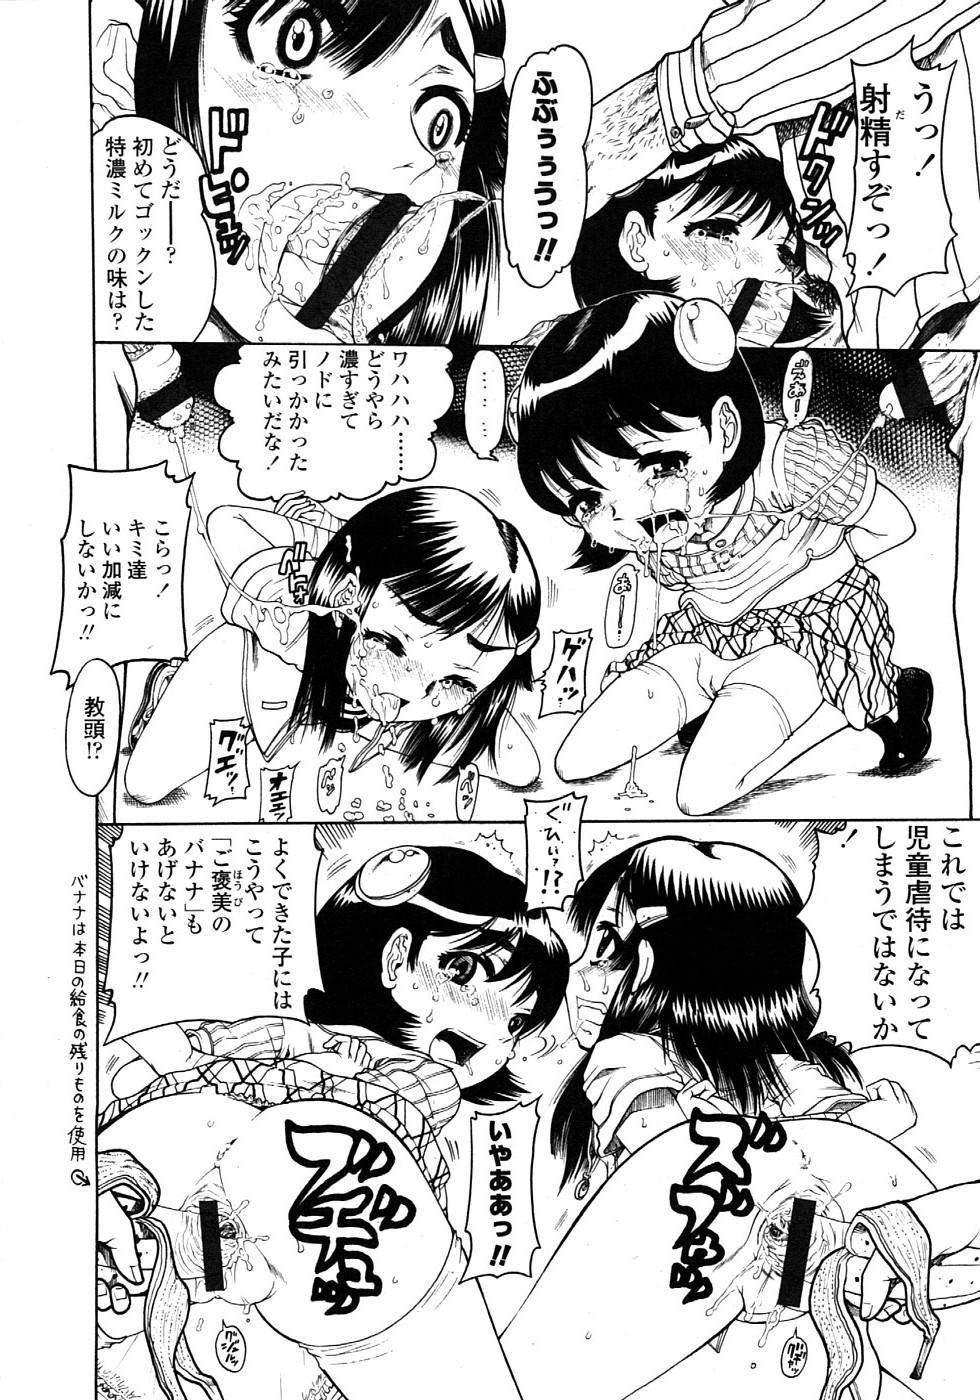 Comic LO 2008-11 Vol. 56 261